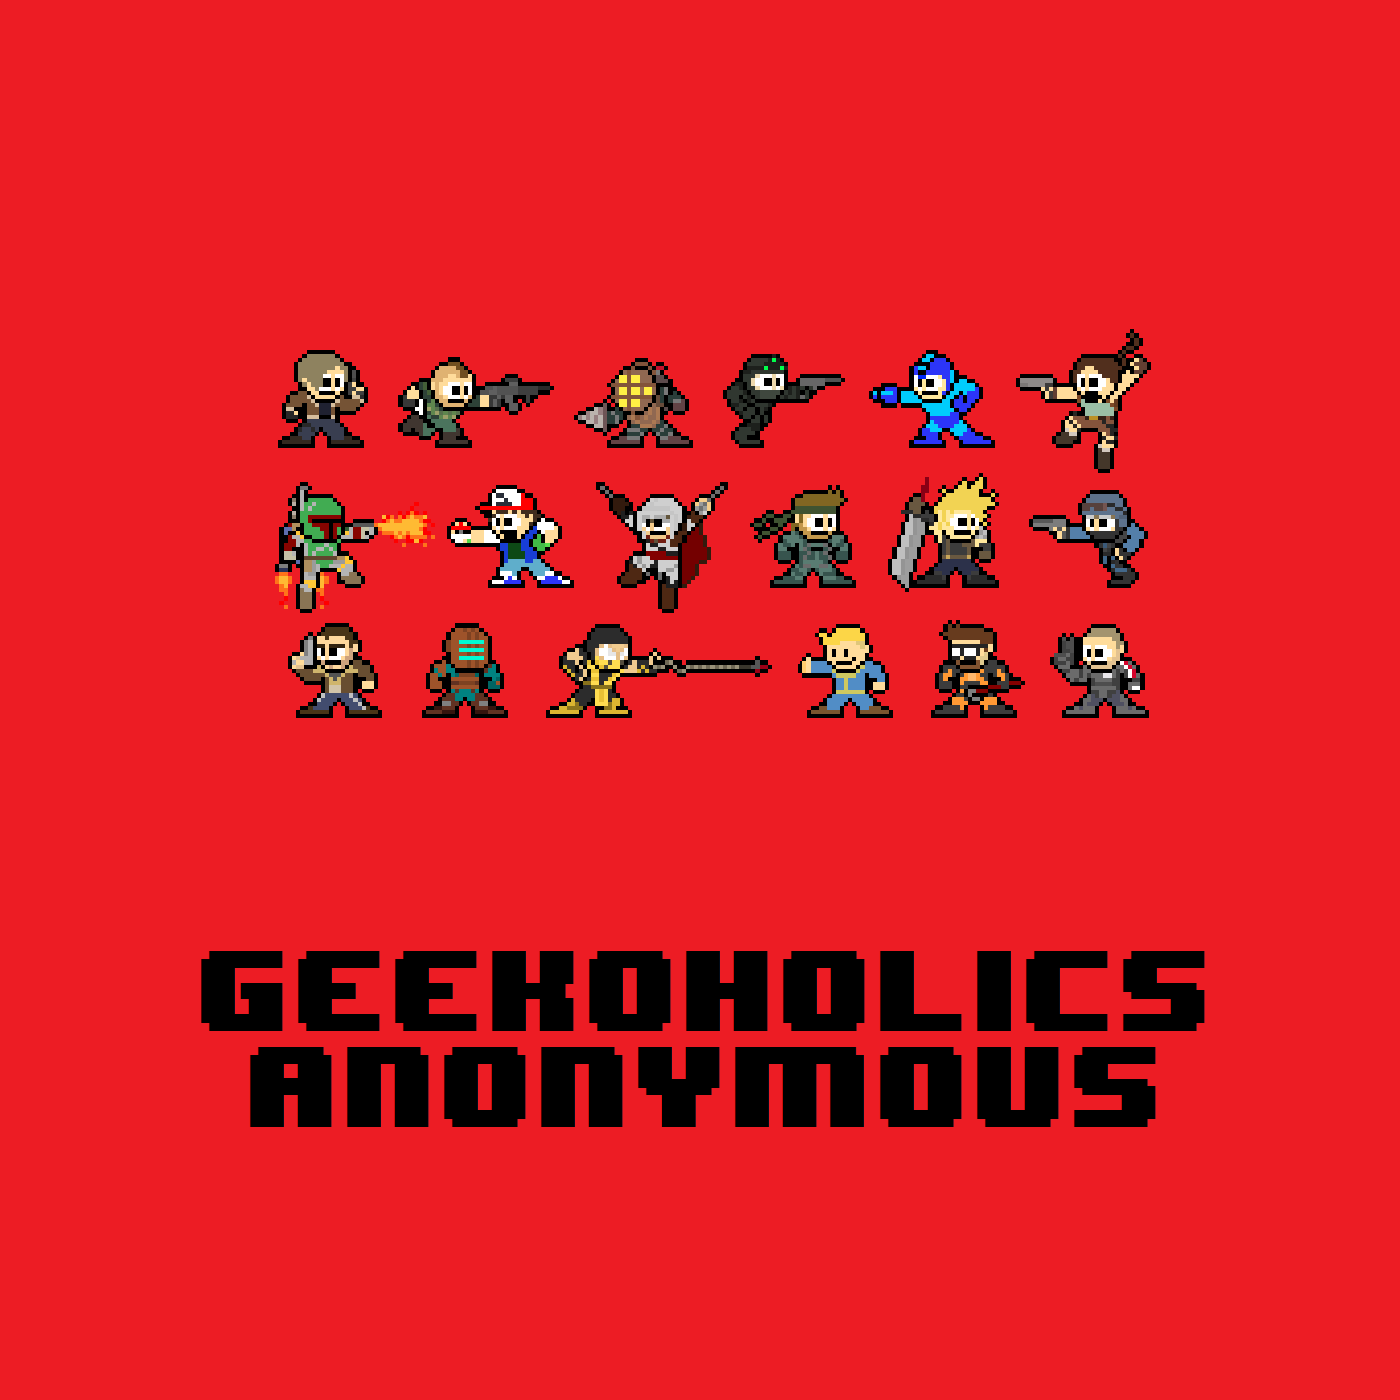 Mario Golf Super Rush, Alex Kidd, Code Vein and more - Geekoholics Anonymous Podcast 312 show art